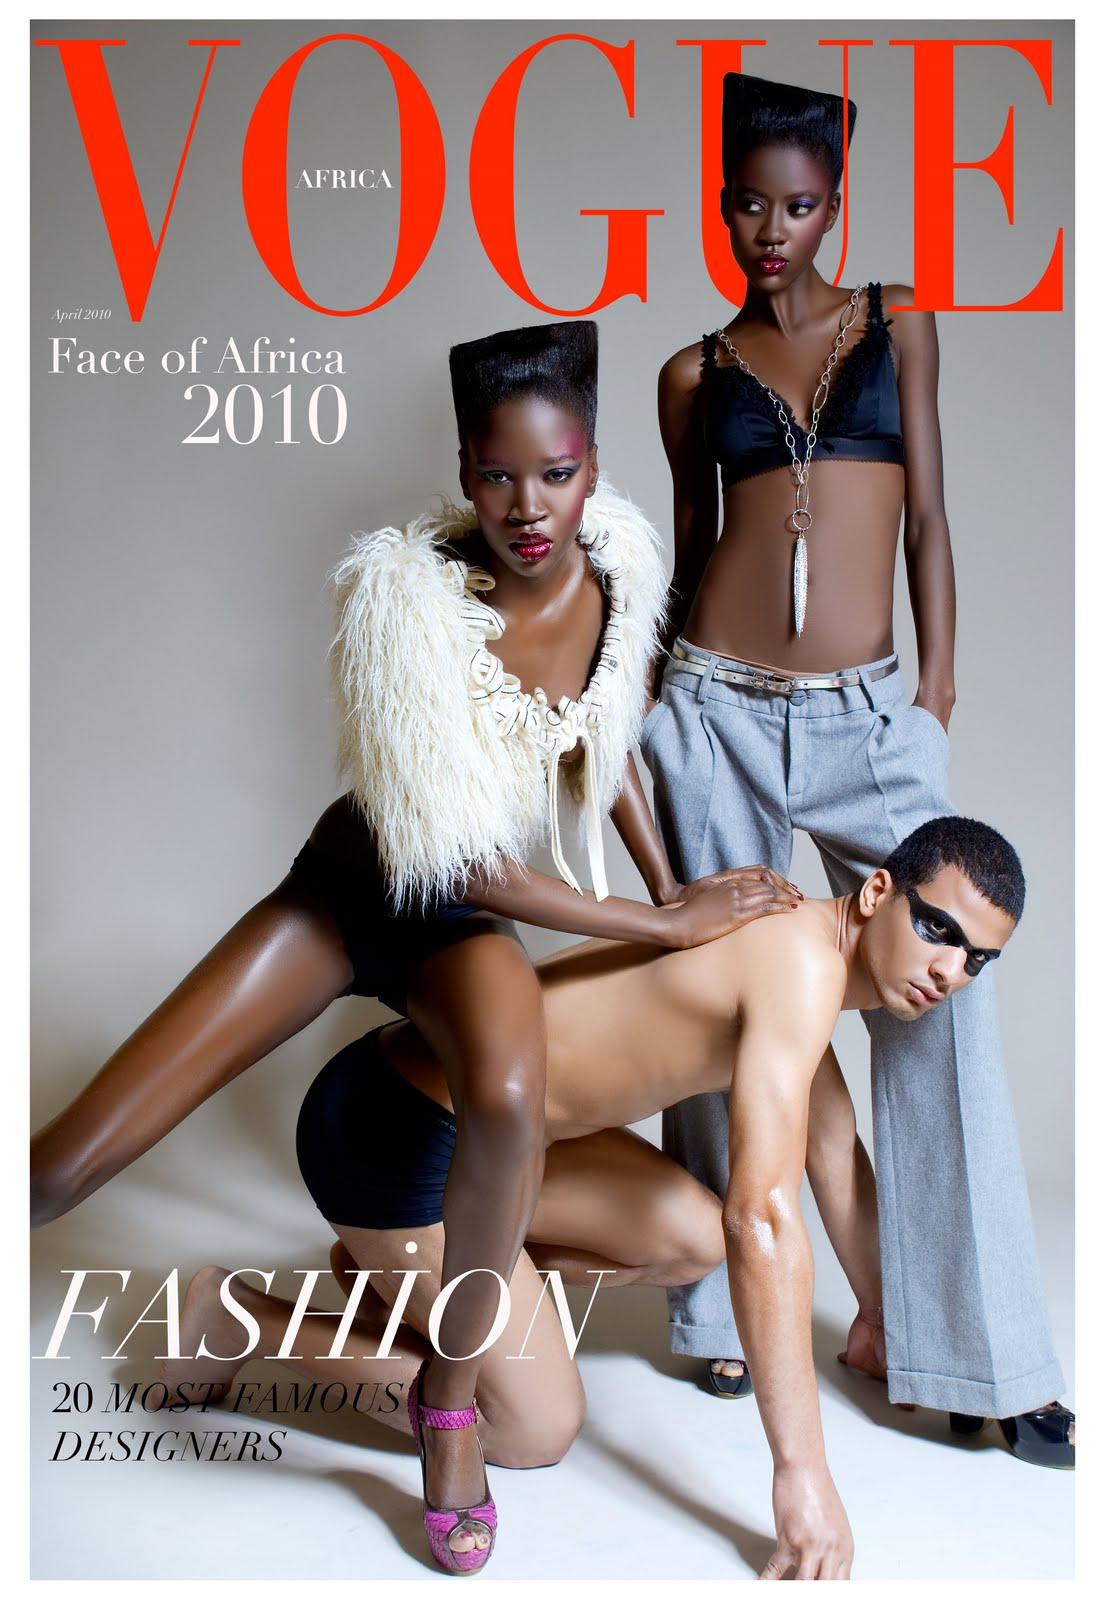 http://2.bp.blogspot.com/_qJpXzwx0mN0/TAfJ0mXyJkI/AAAAAAAABWE/YNetdlQ_lr8/s1600/Vogue_Africa.jpg